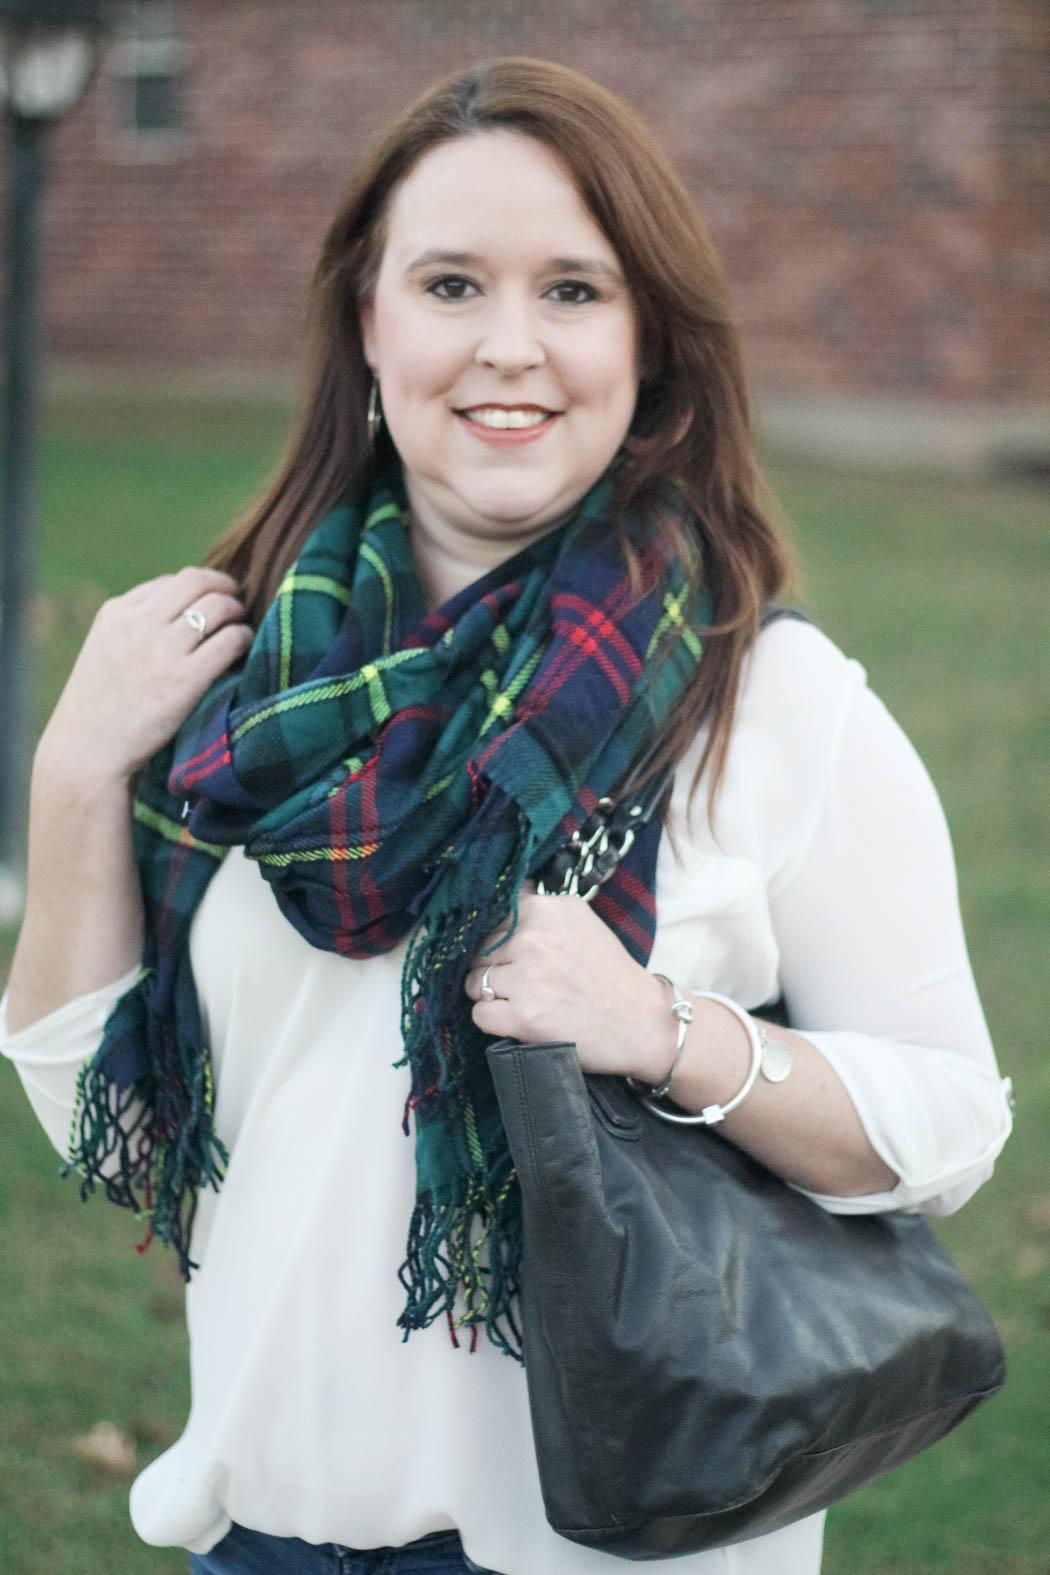 target-scarf-lush-tunic-ag-jeans-coach-bag-charles-david-booties-3